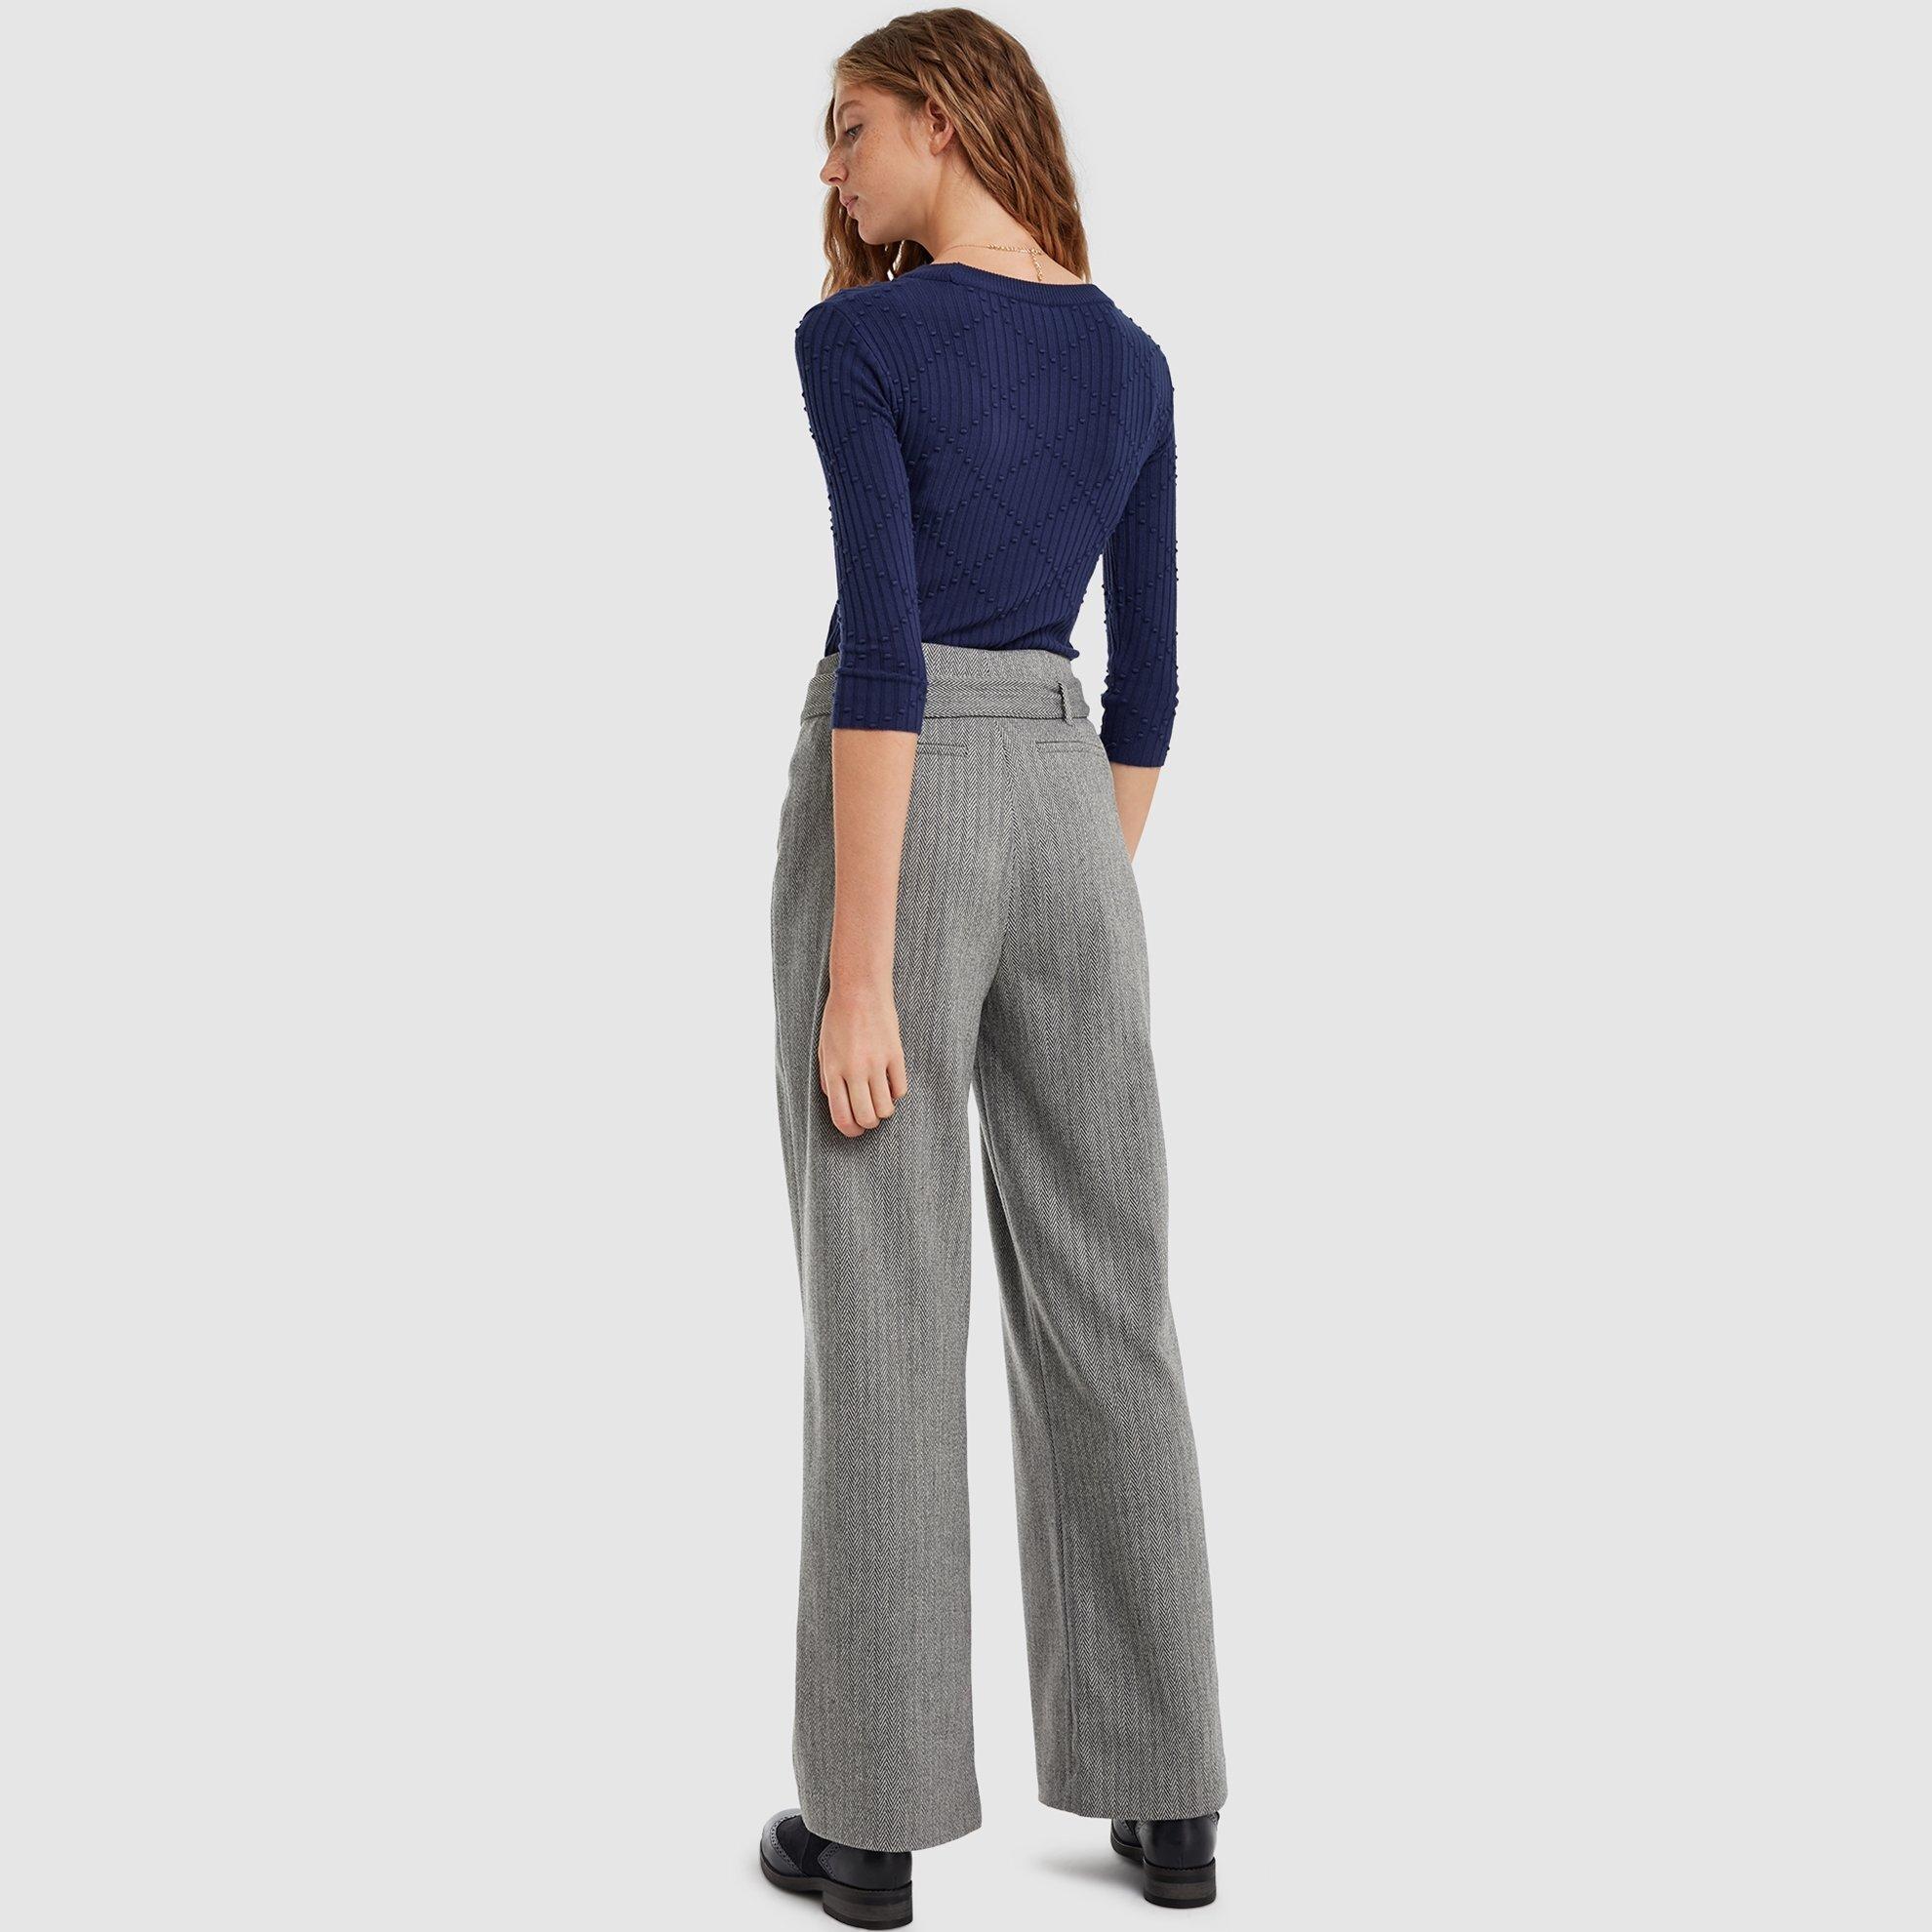 resm Kemer Detaylı Geniş Paça Pantolon